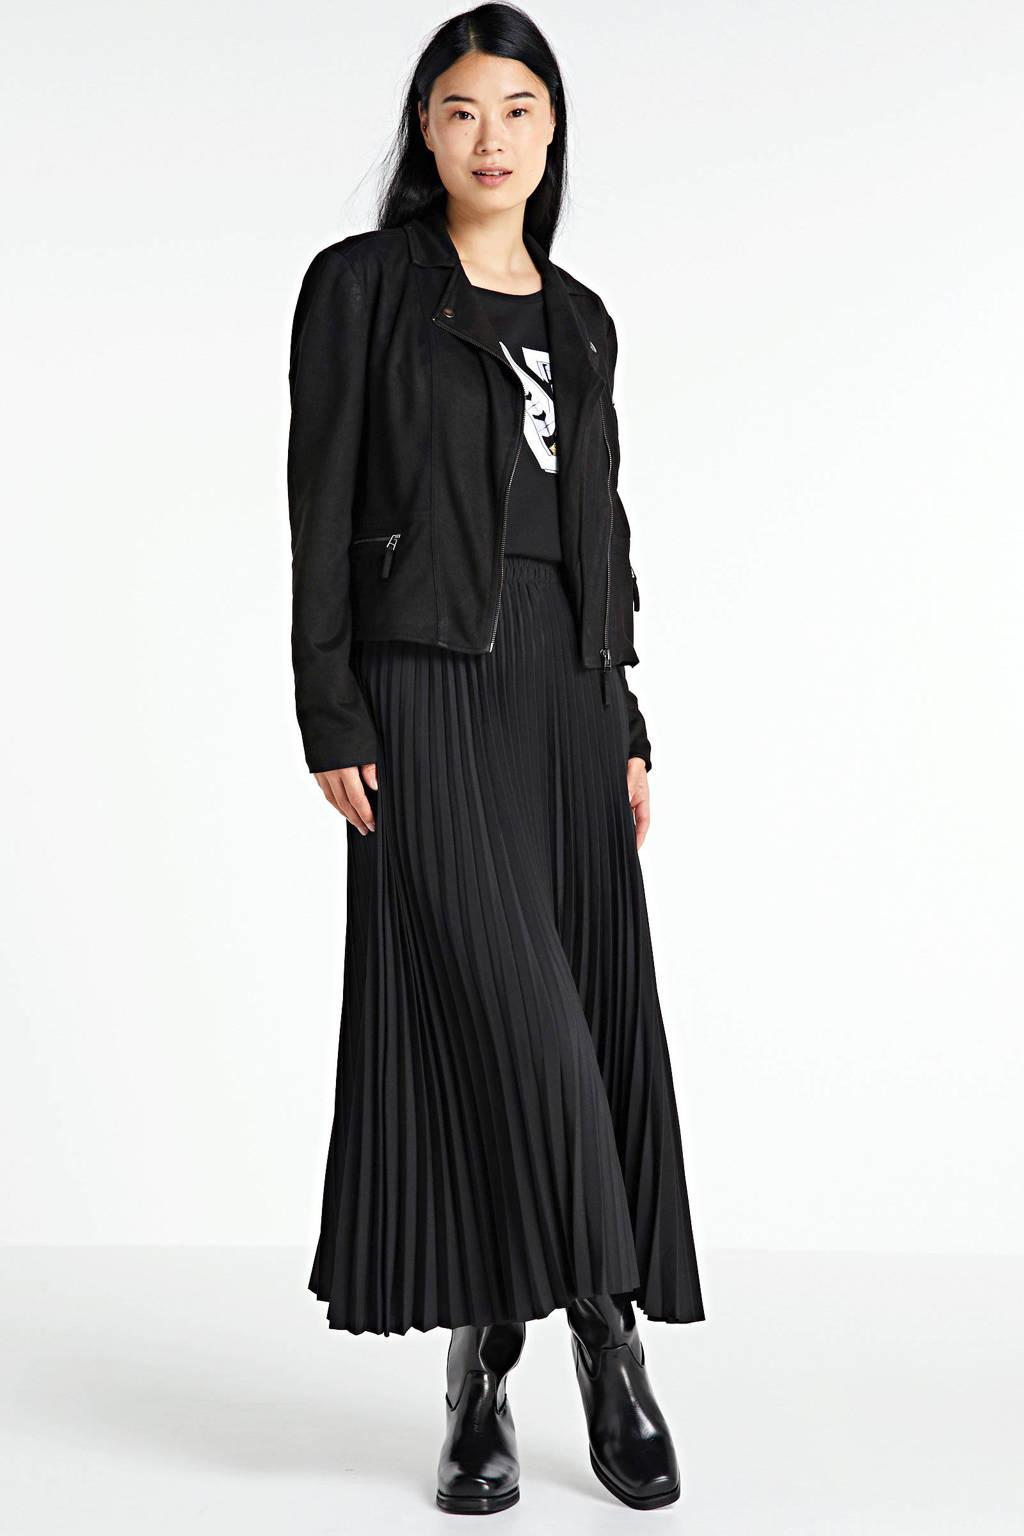 FREEQUENT zomerjas zwart, Zwart